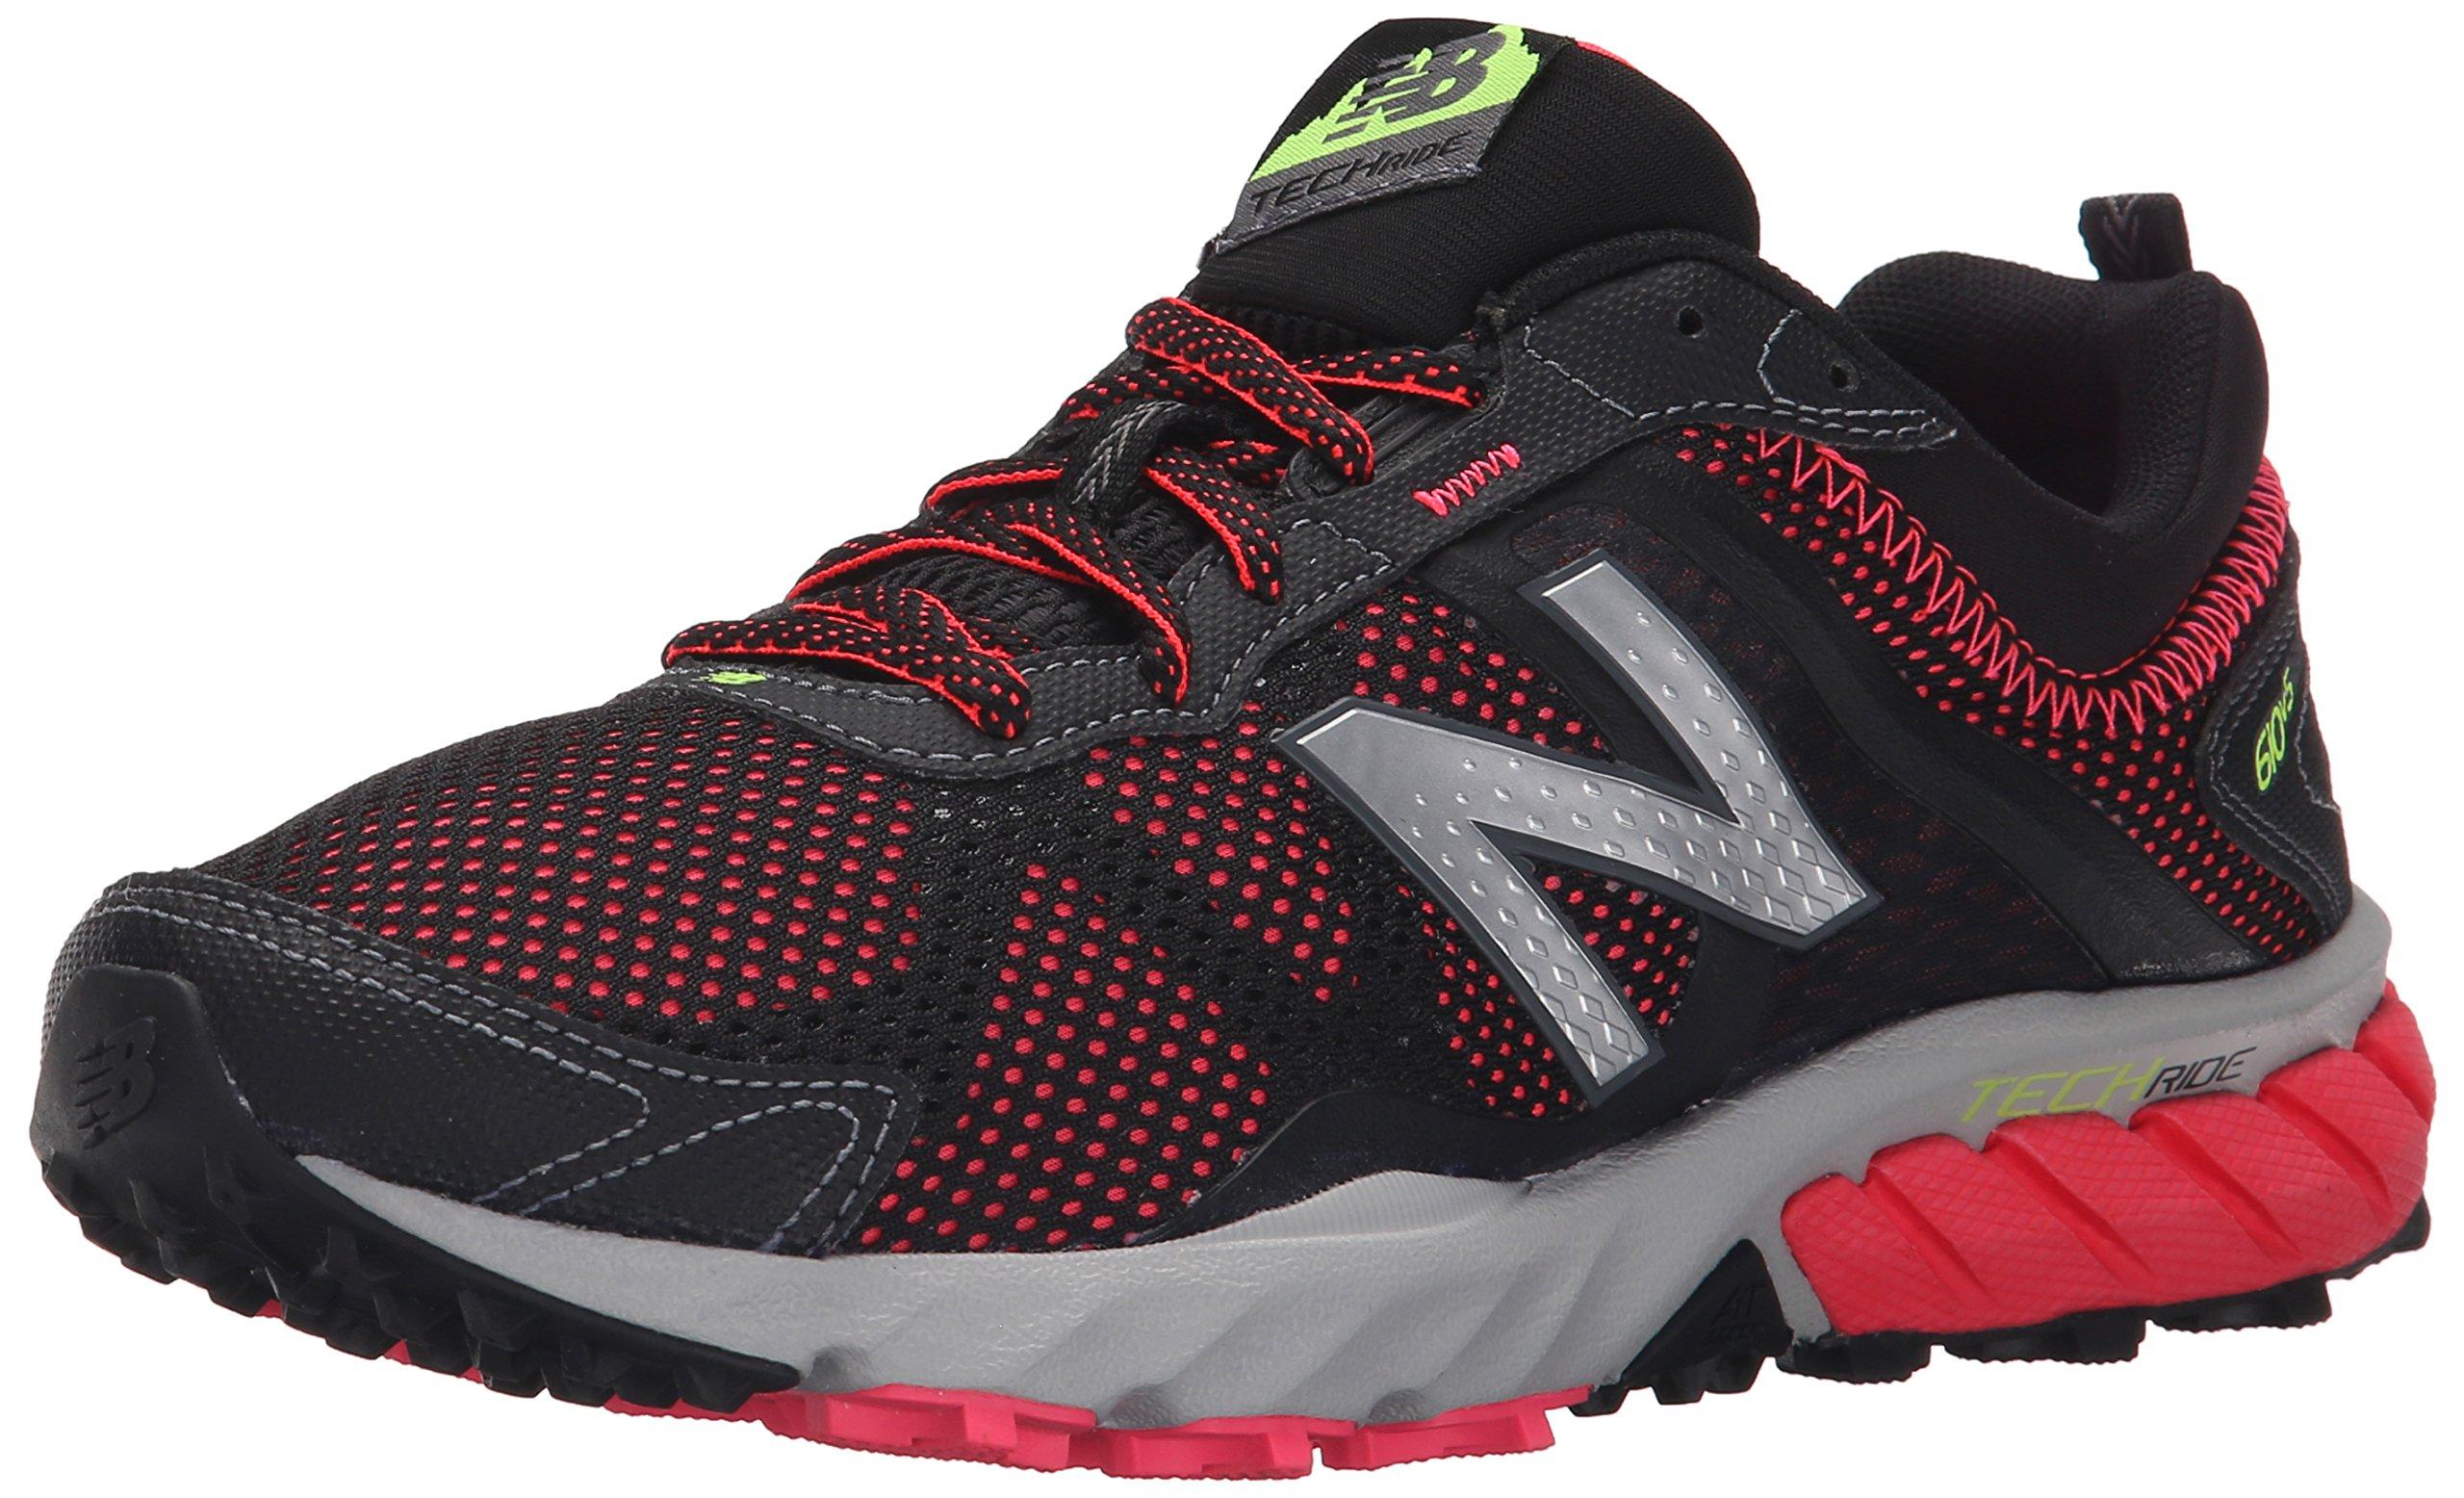 New Balance Women's WT610V5 Trail Shoe, Black/Pink, 8 B US